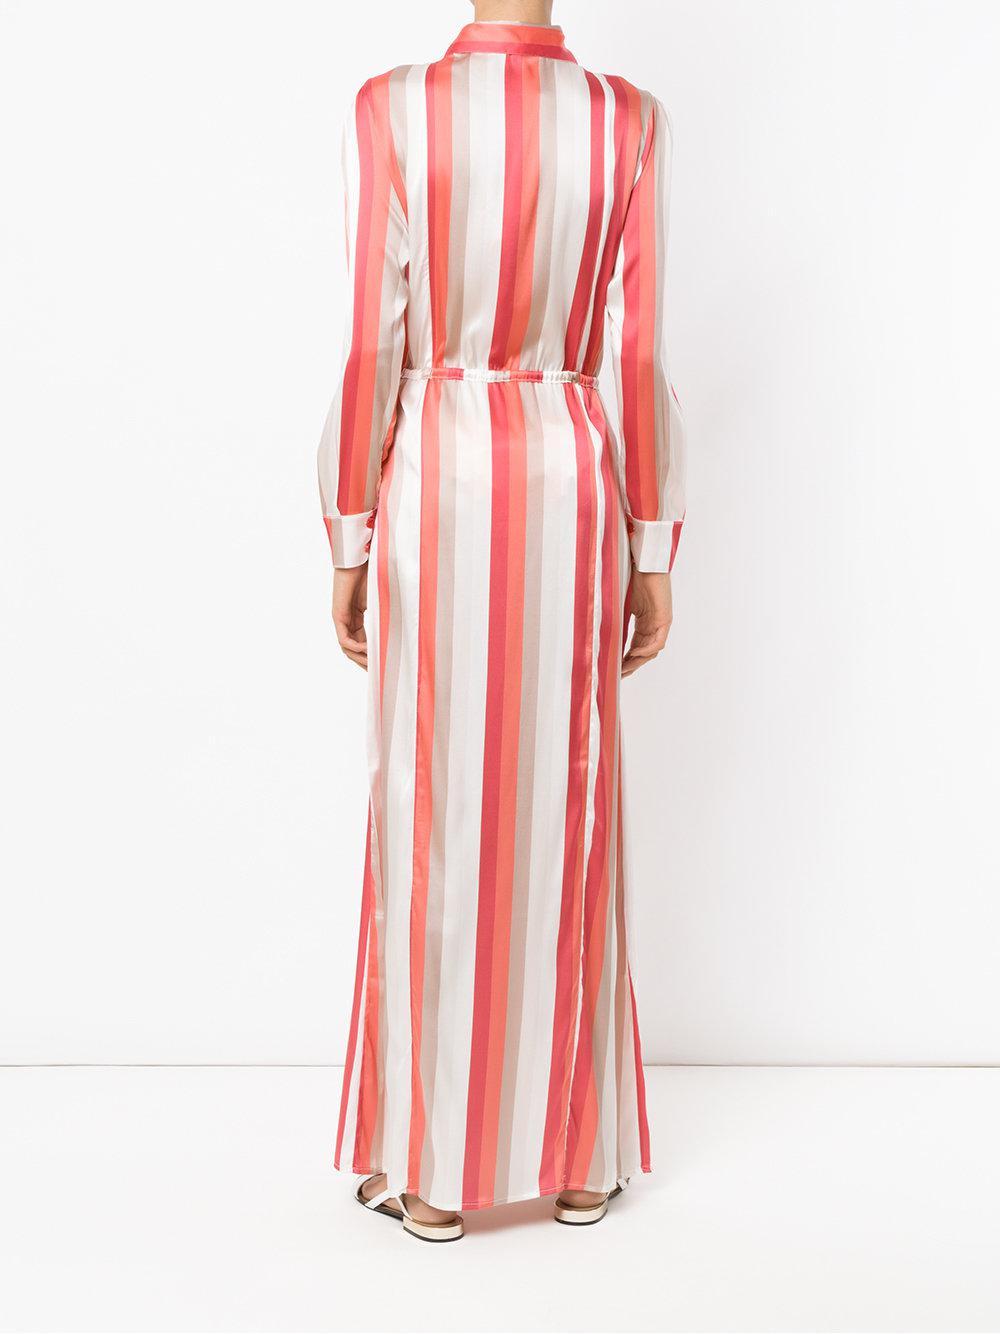 Discount View Buy Cheap Shop Offer silk beach dress - Multicolour Amir Slama Cost 9ef9S